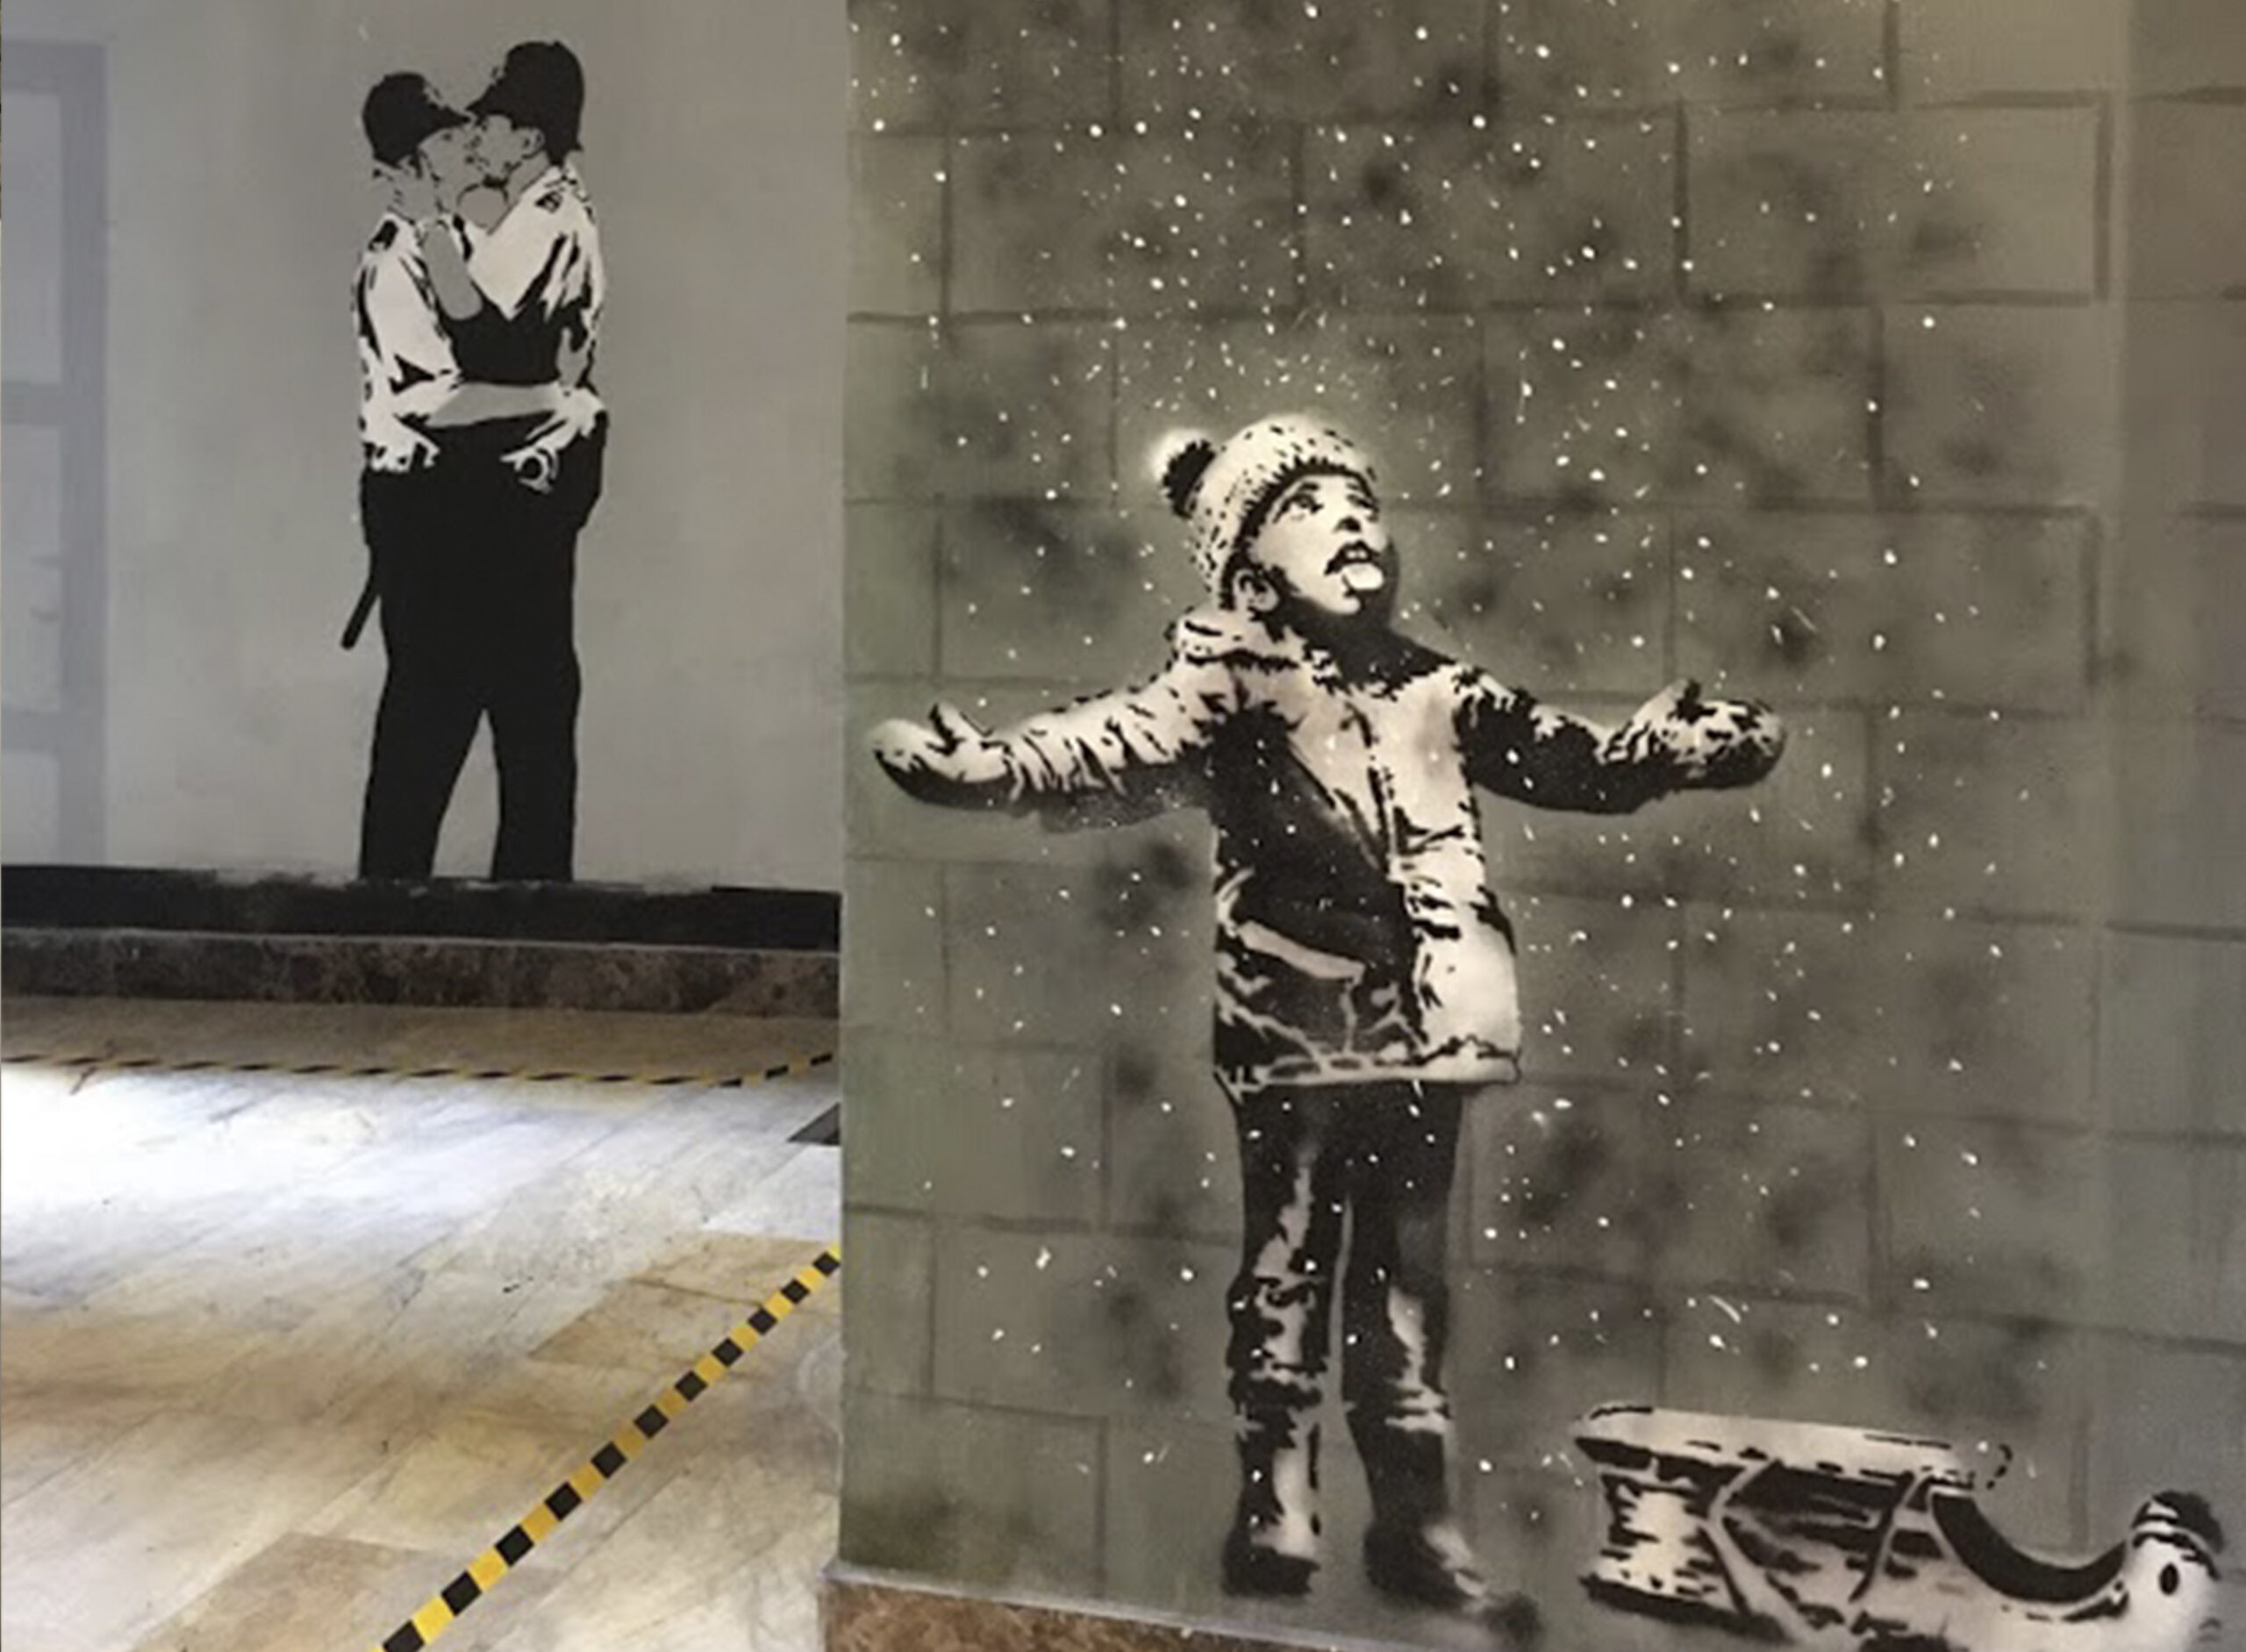 Bansky-greatings-season-street-art-magazinehorse